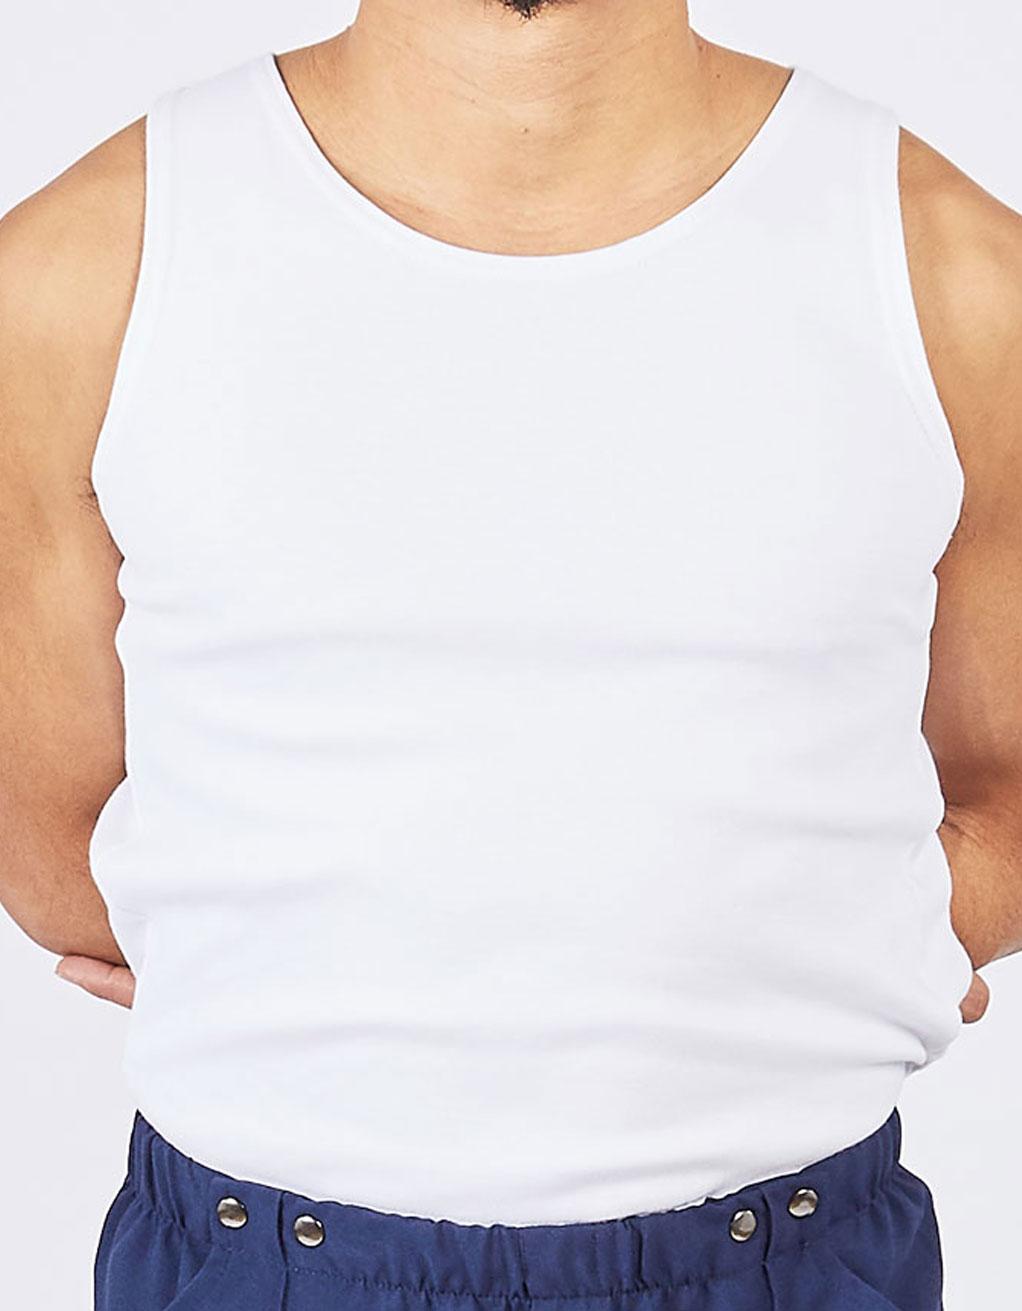 camisole-adaptee-unisexe-homme-FC62350-blanc